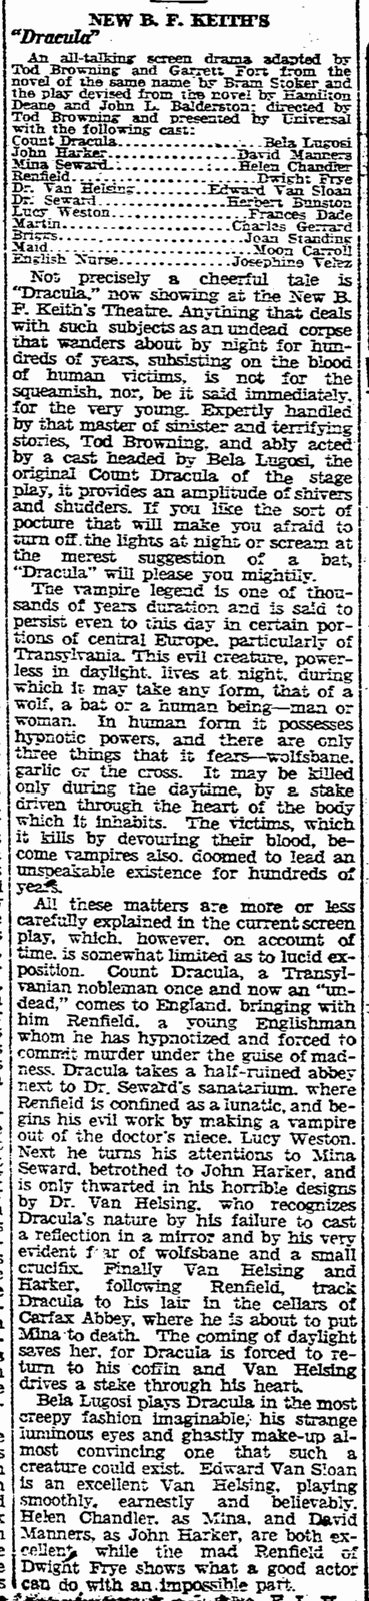 Dracula, Boston Herald, April 4, 1931 2